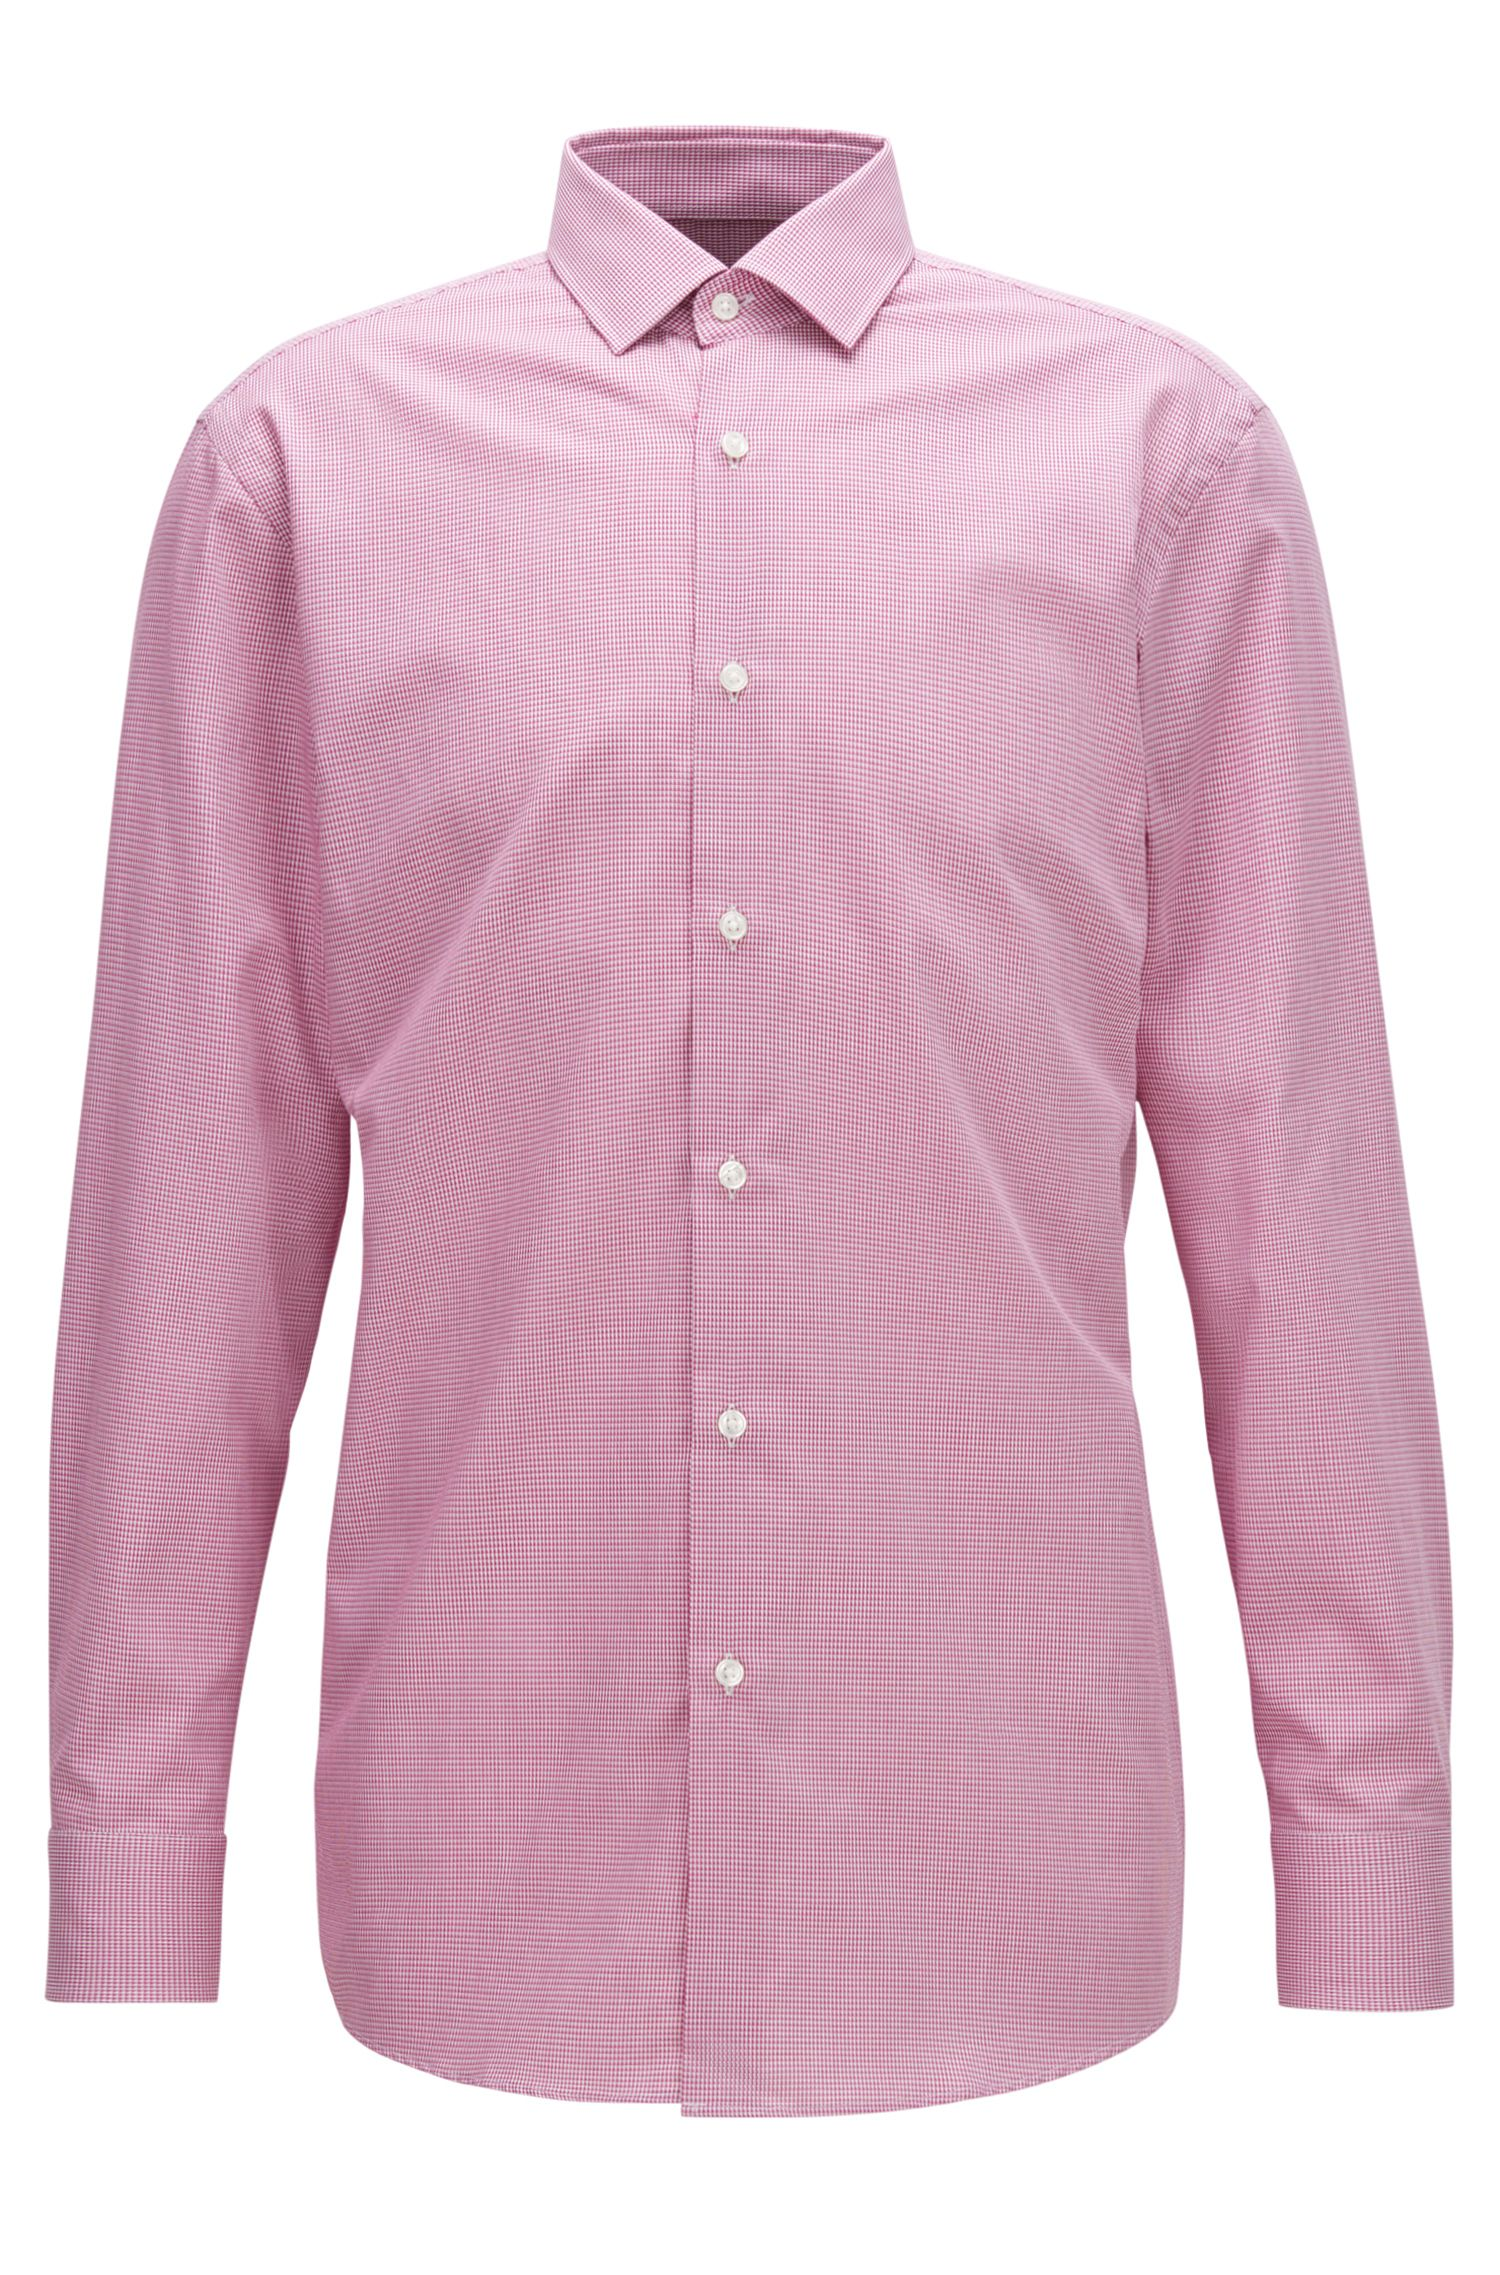 Nailhead Cotton Dress Shirt, Slim Fit | Marley US, Dark pink